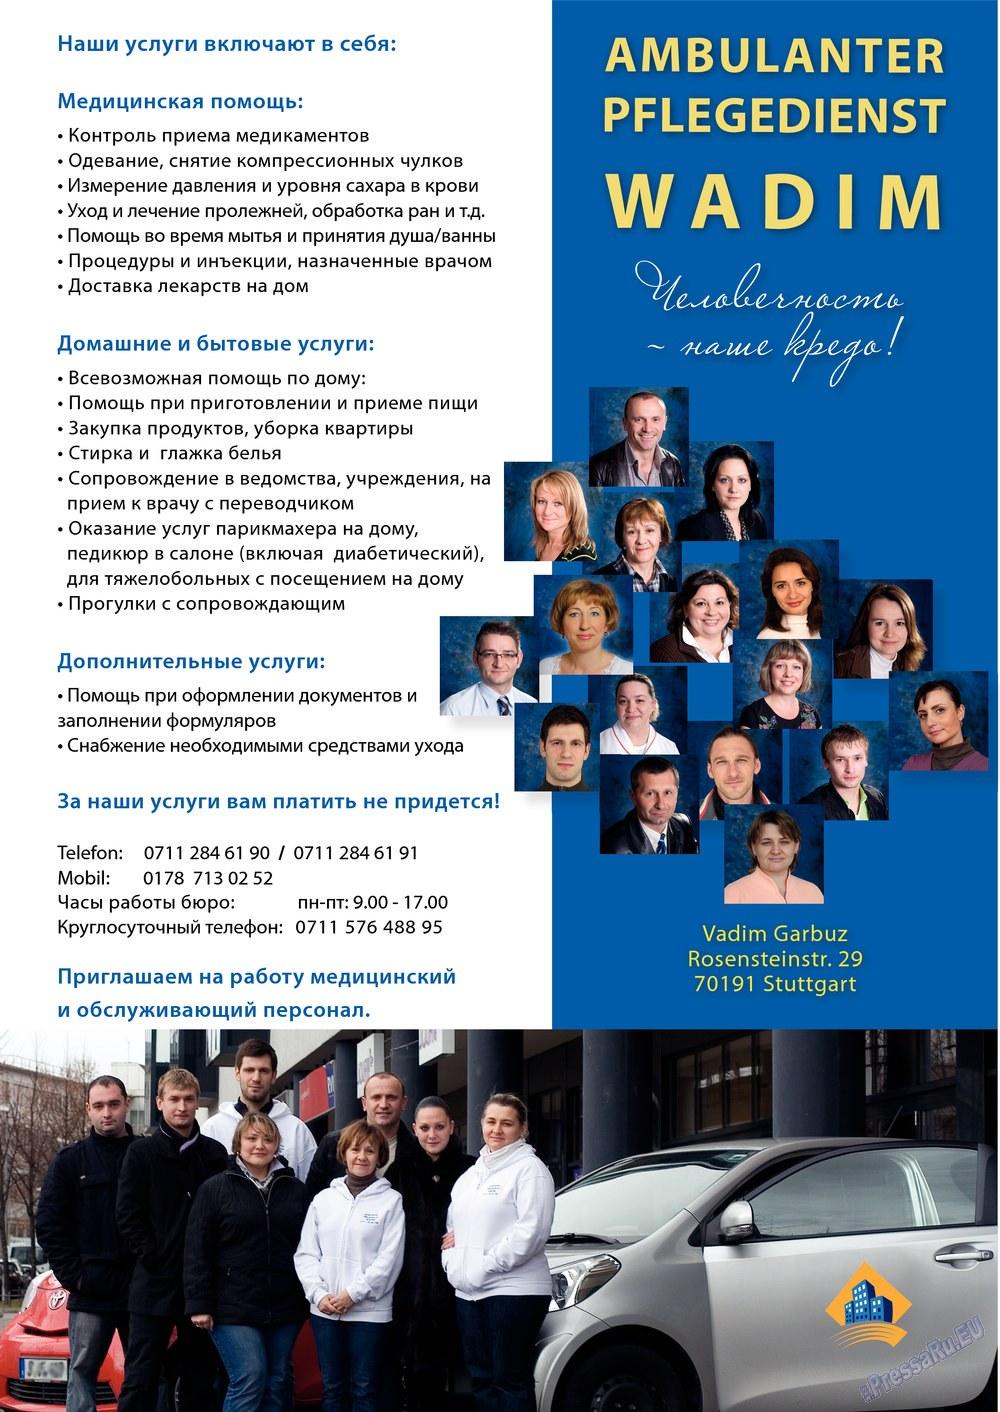 Wadim (журнал). 2013 год, номер 5, стр. 40